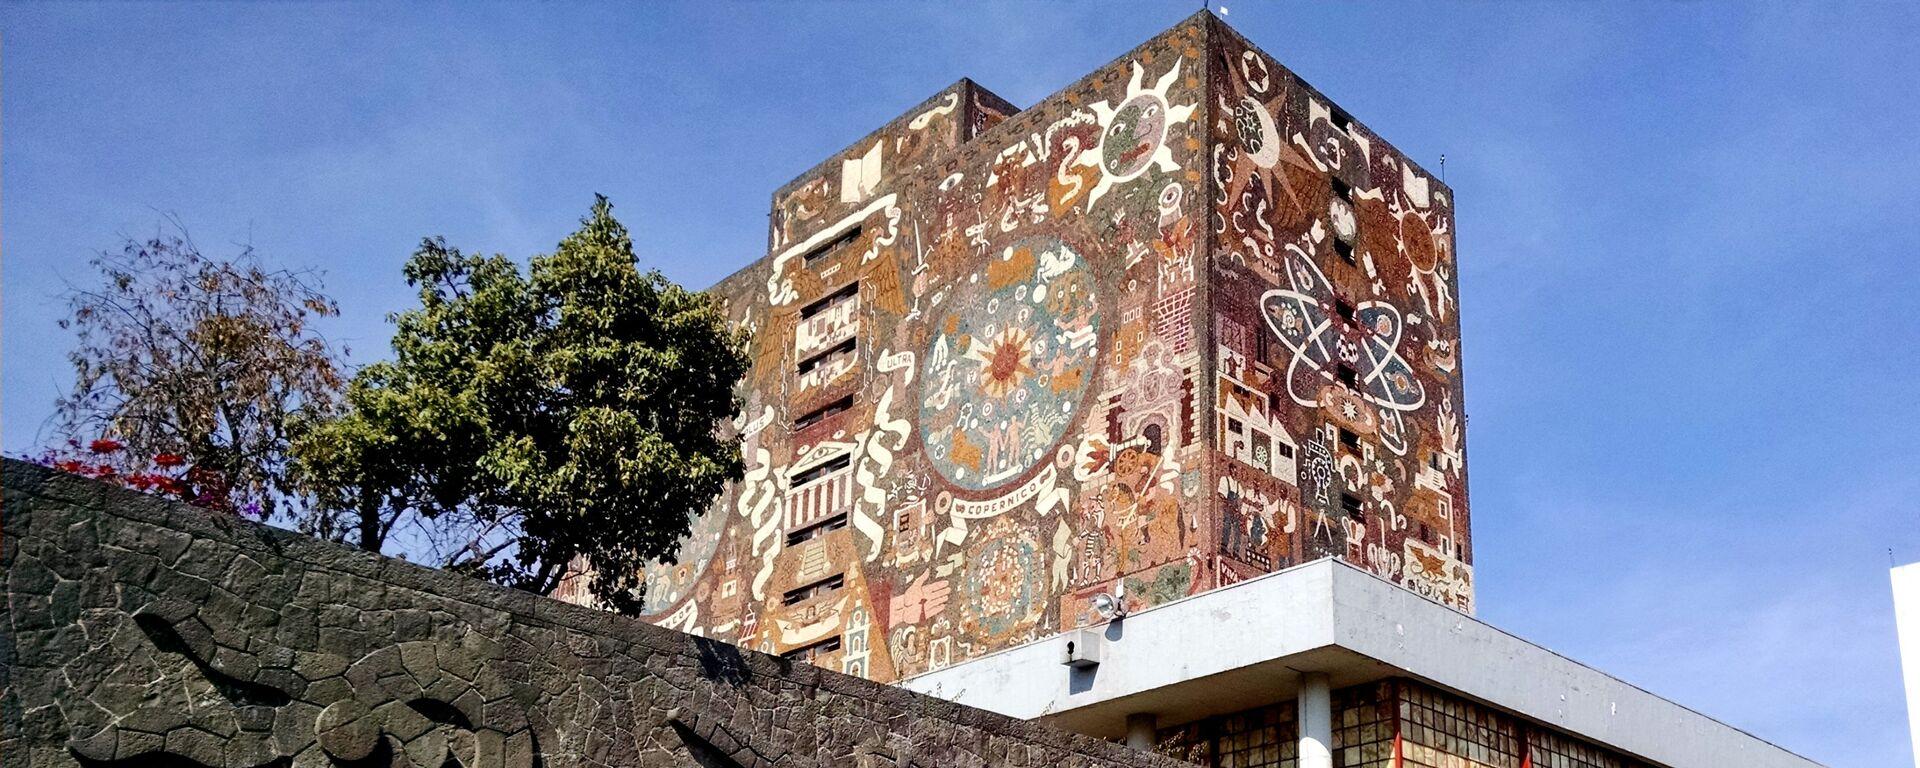 La Universidad Nacional Autónoma de México (UNAM) - Sputnik Mundo, 1920, 17.12.2020